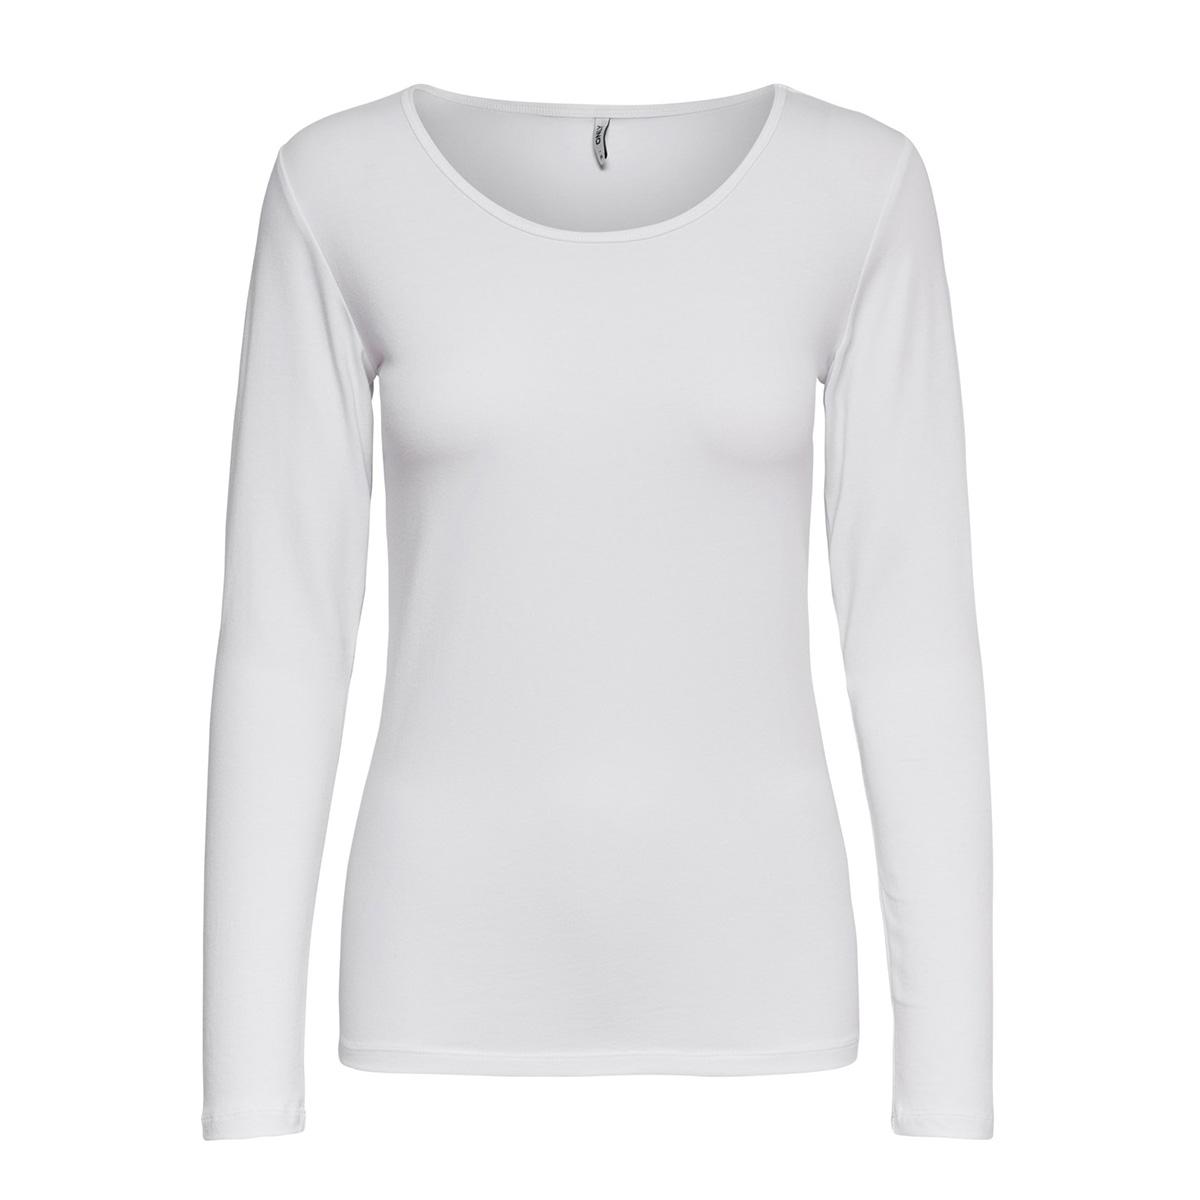 onllive love l/s o-neck top noos jr 15204712 only t-shirt white